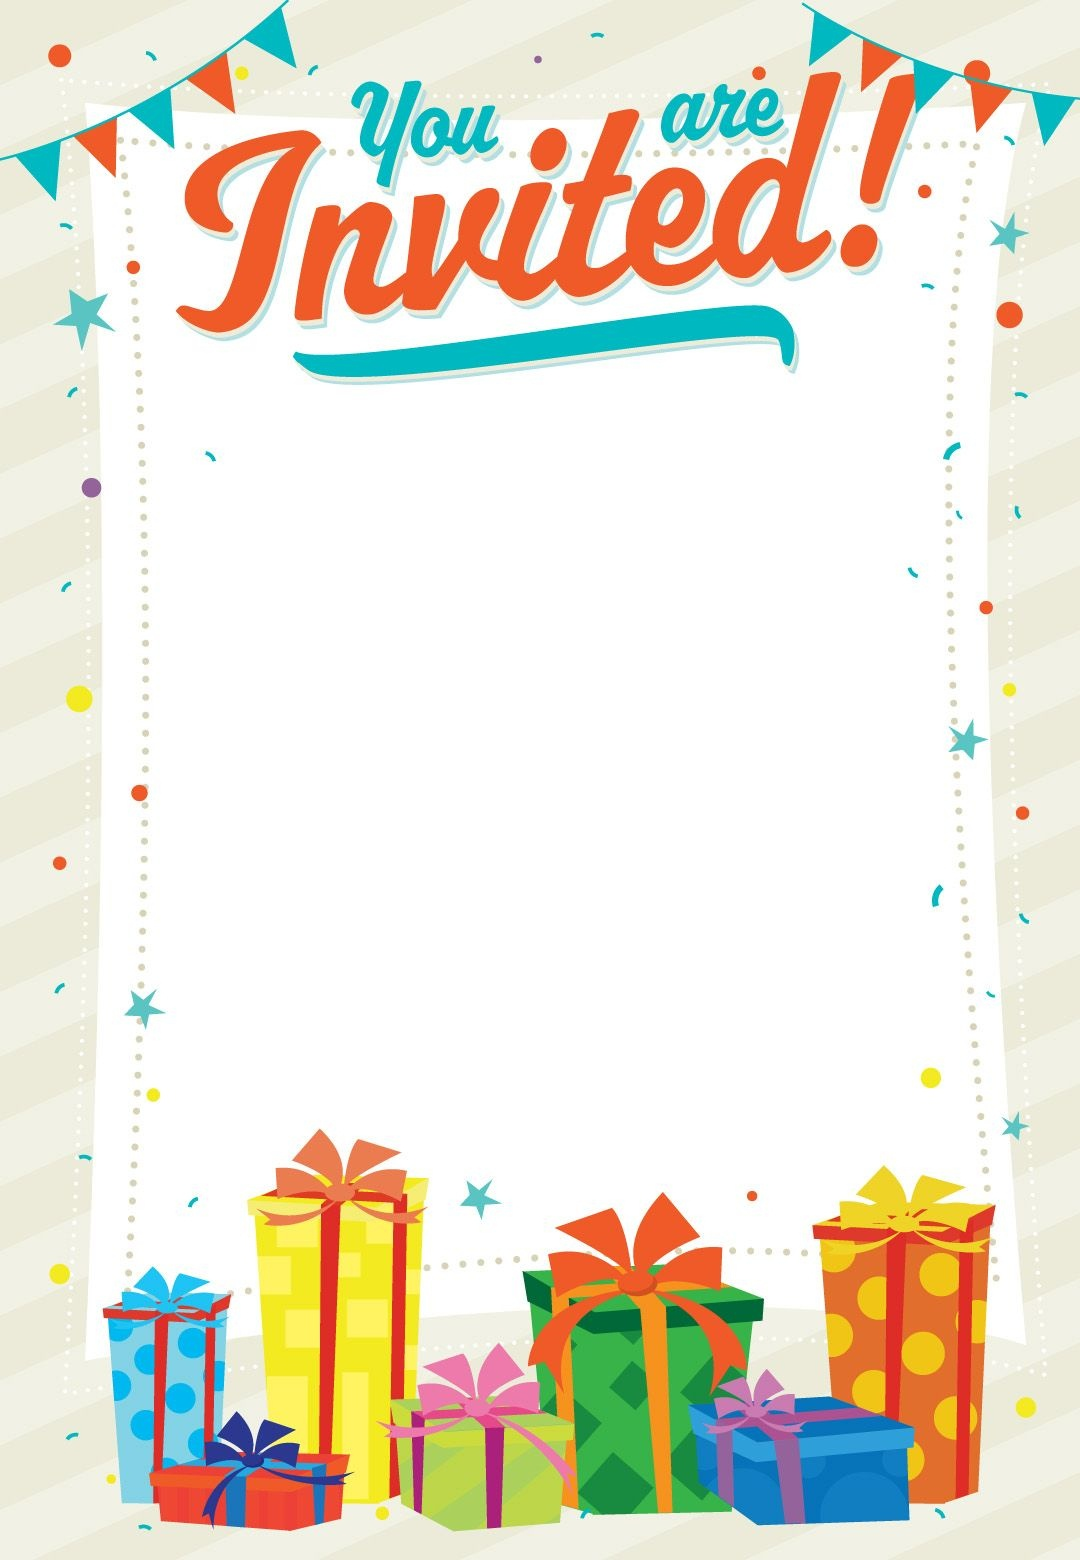 Free Printable You Are Invited Invitation | Printables & Fonts - Free Printable Birthday Invitation Cards Templates